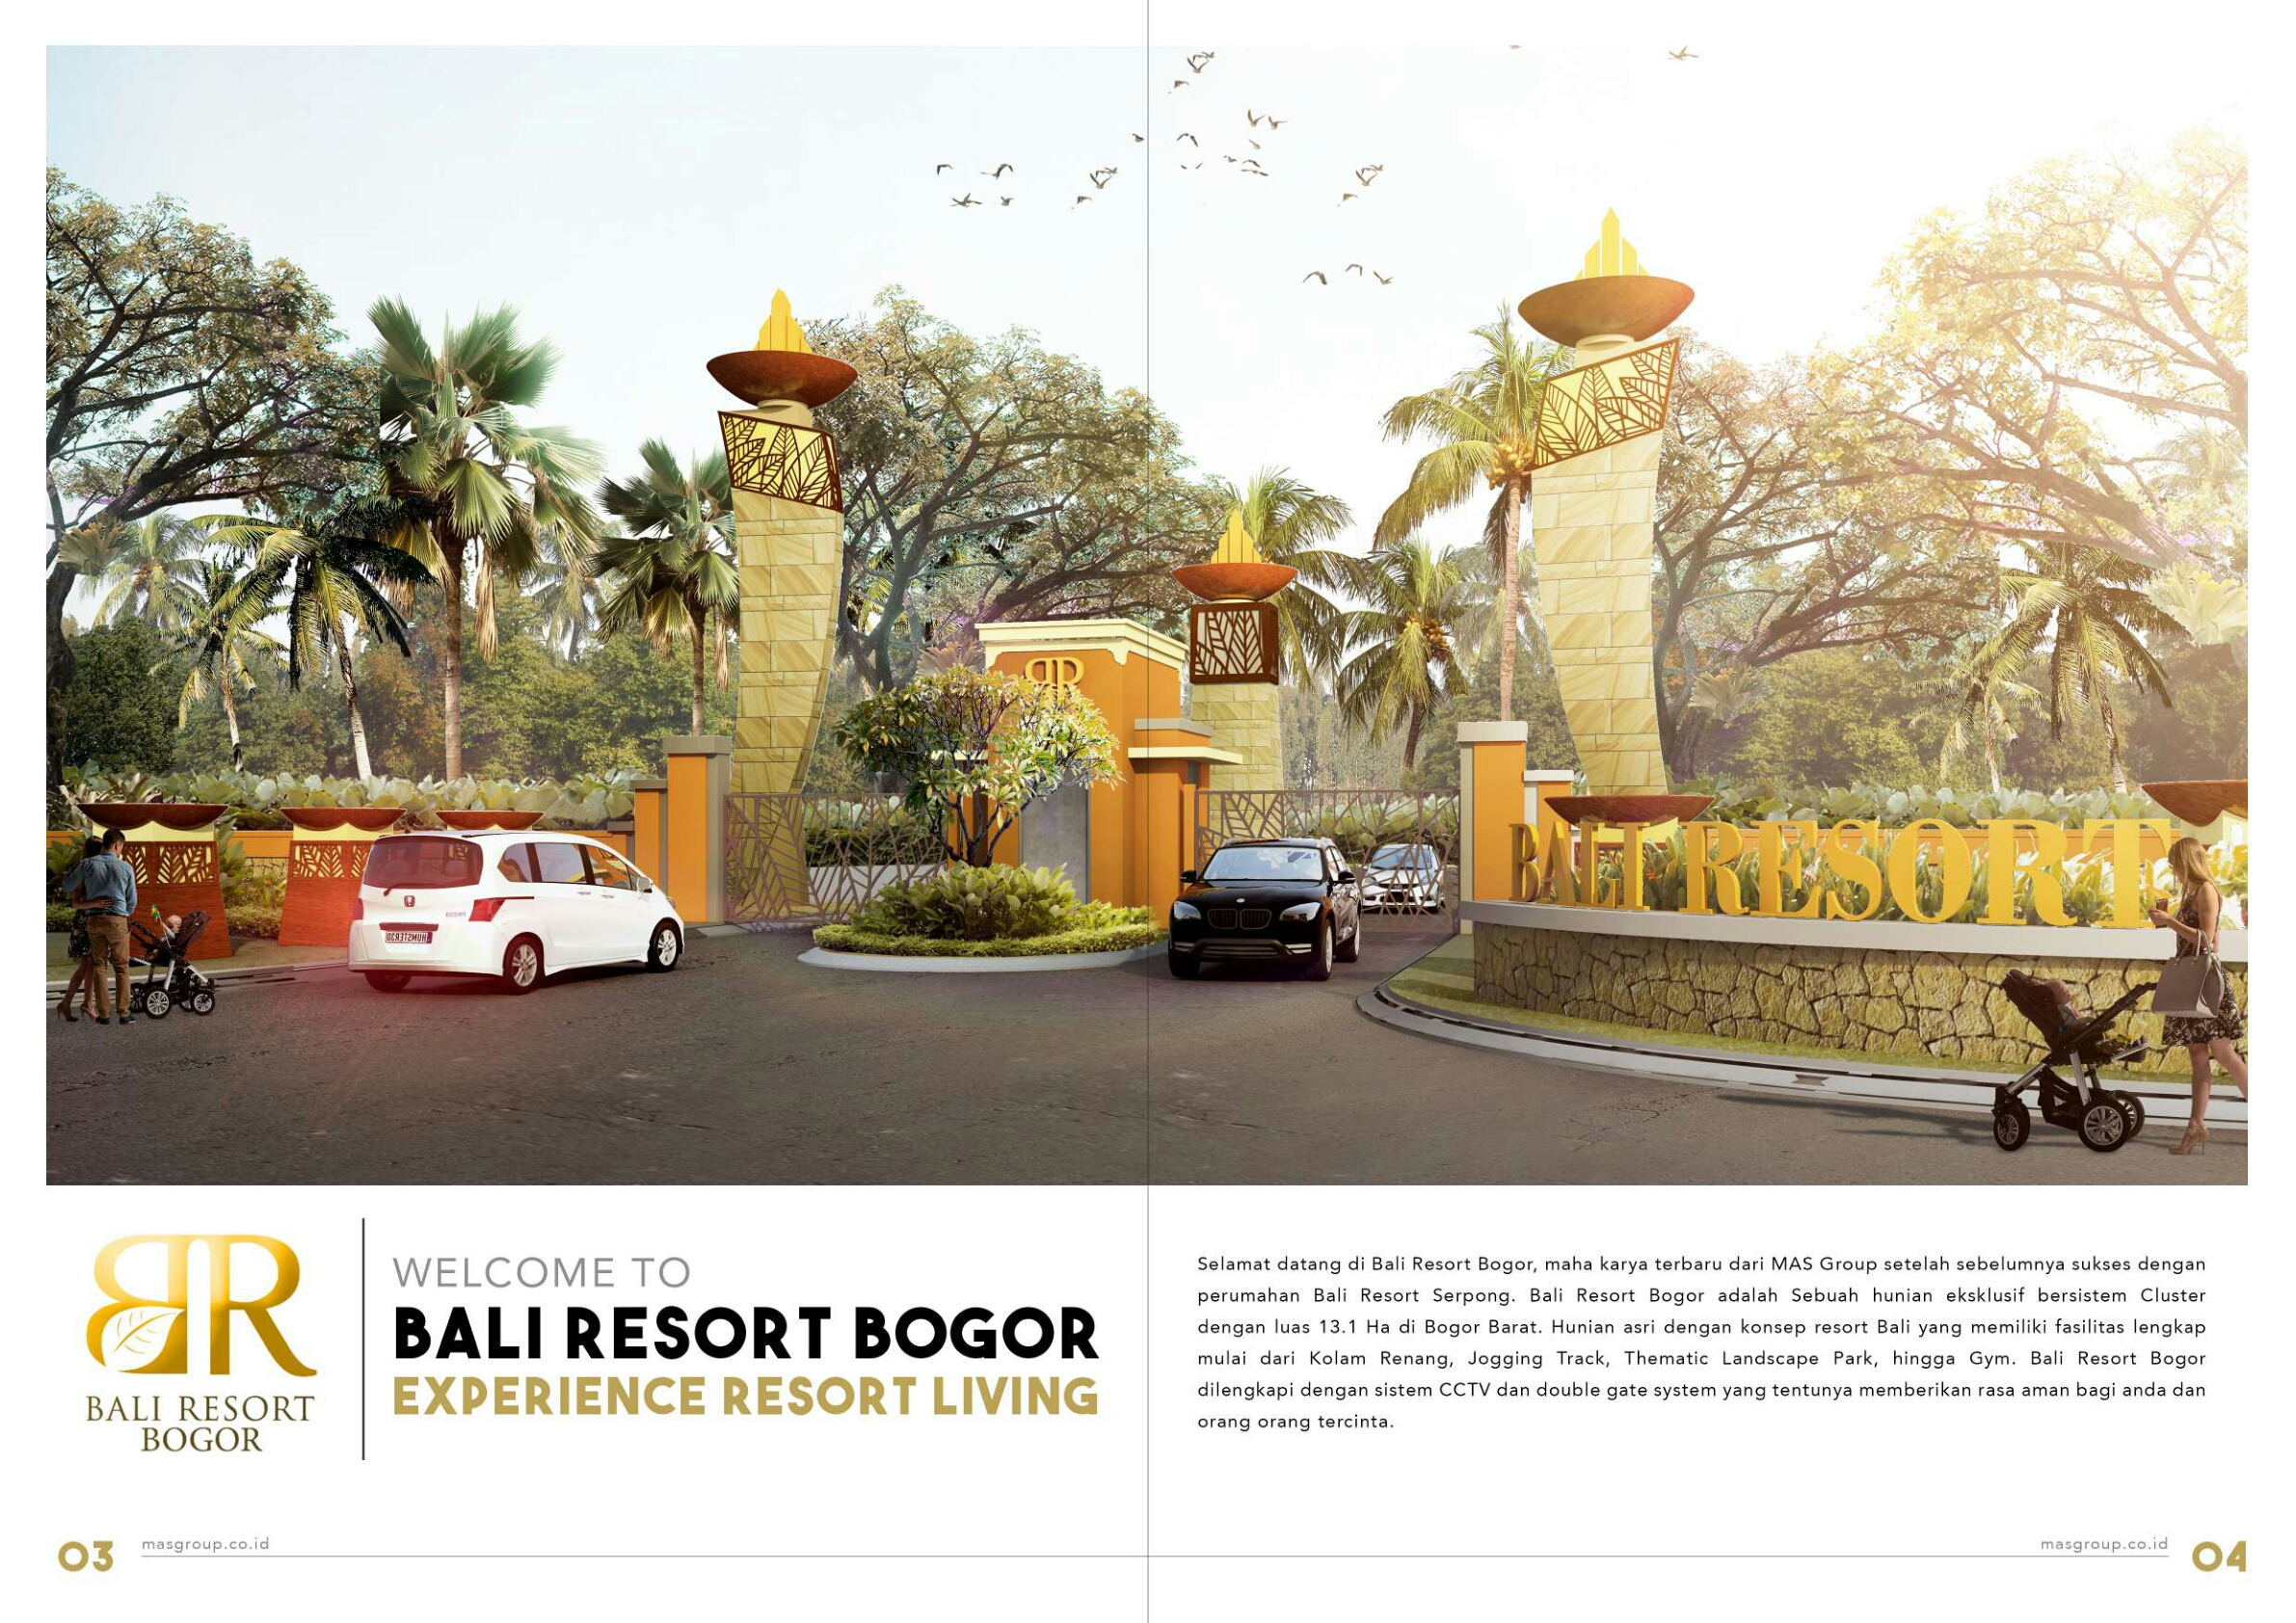 bali-resort-bogor